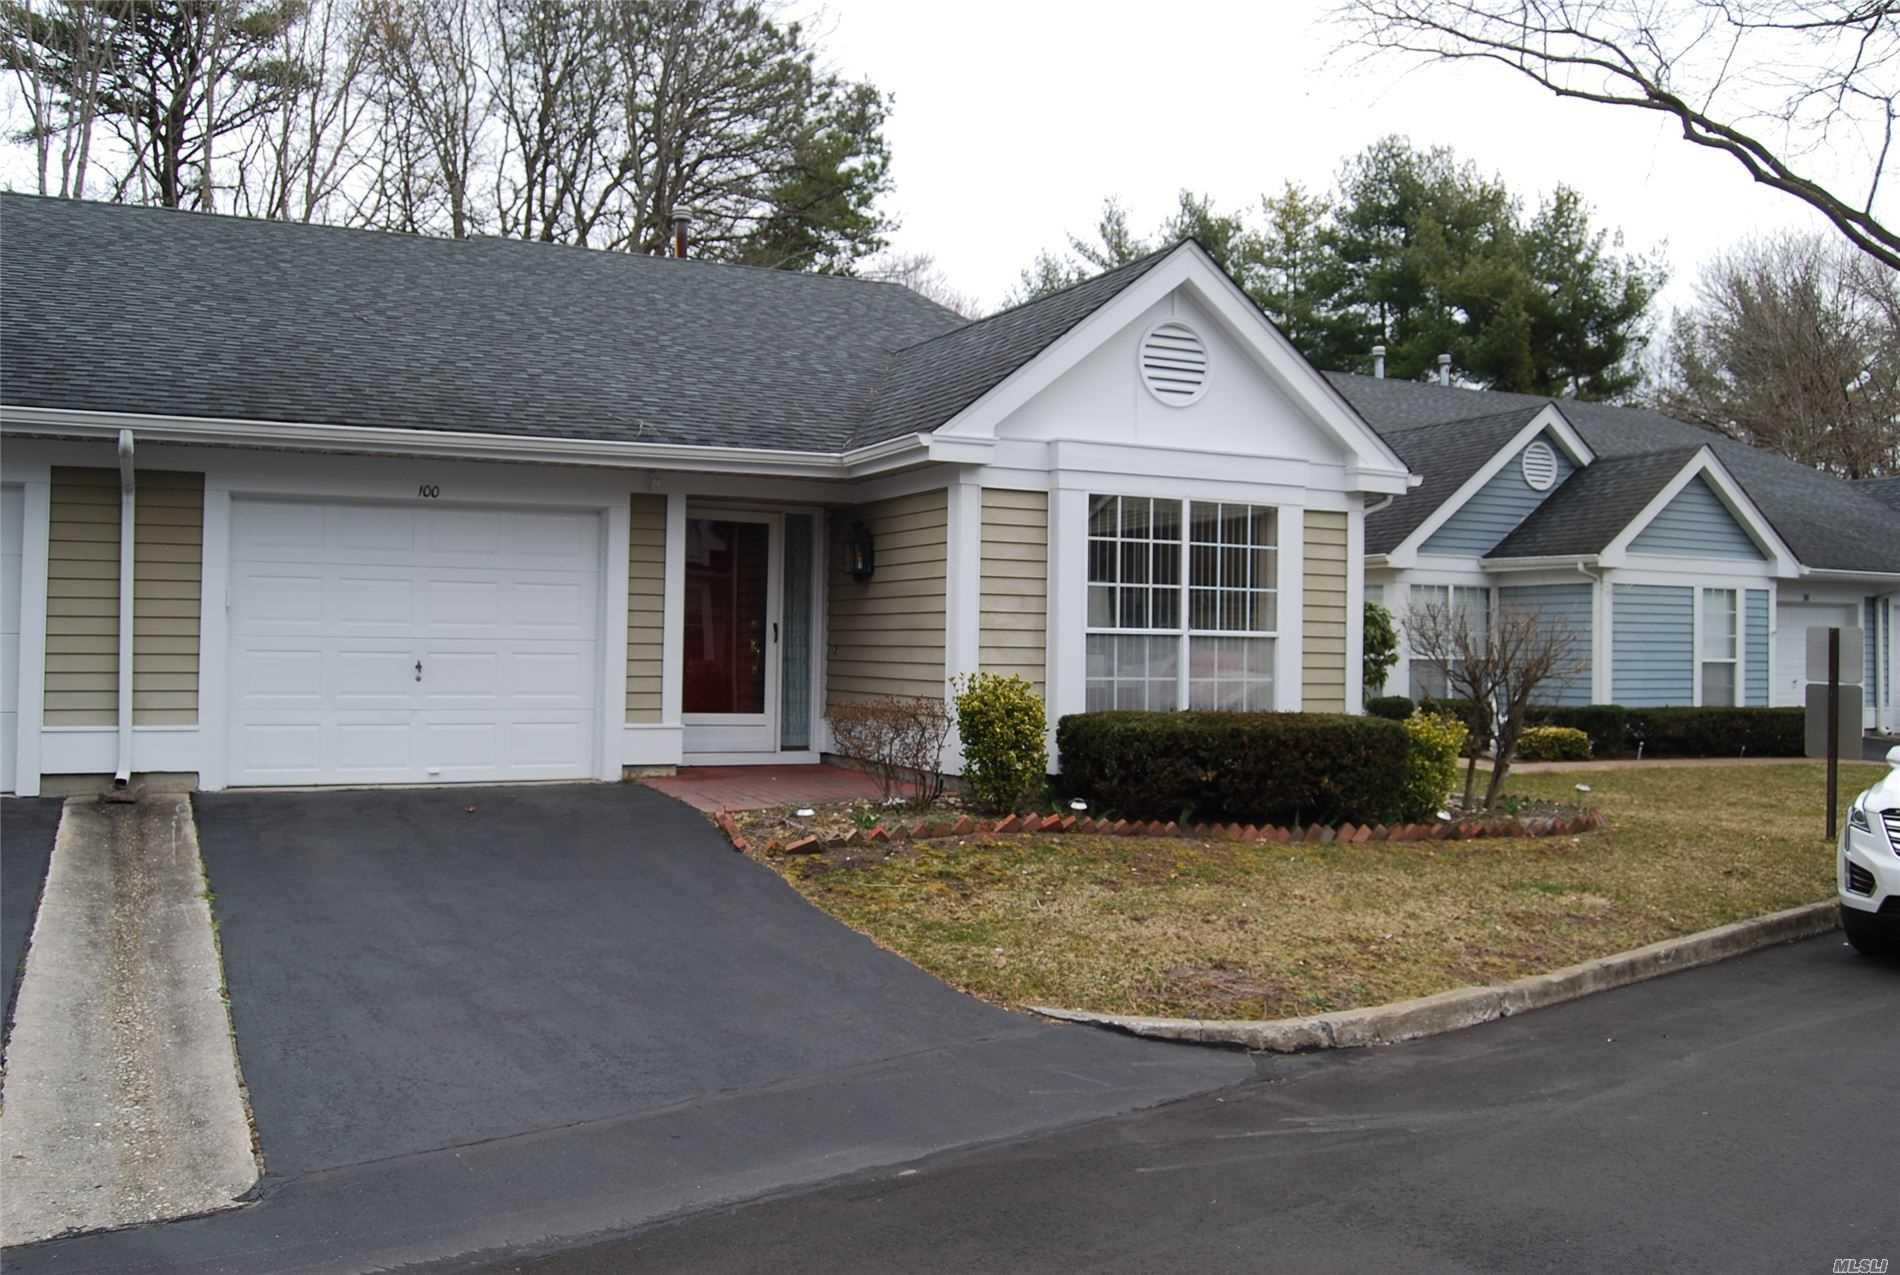 Property for sale at 100 Glen Drive, Ridge NY 11961, Ridge,  New York 11961